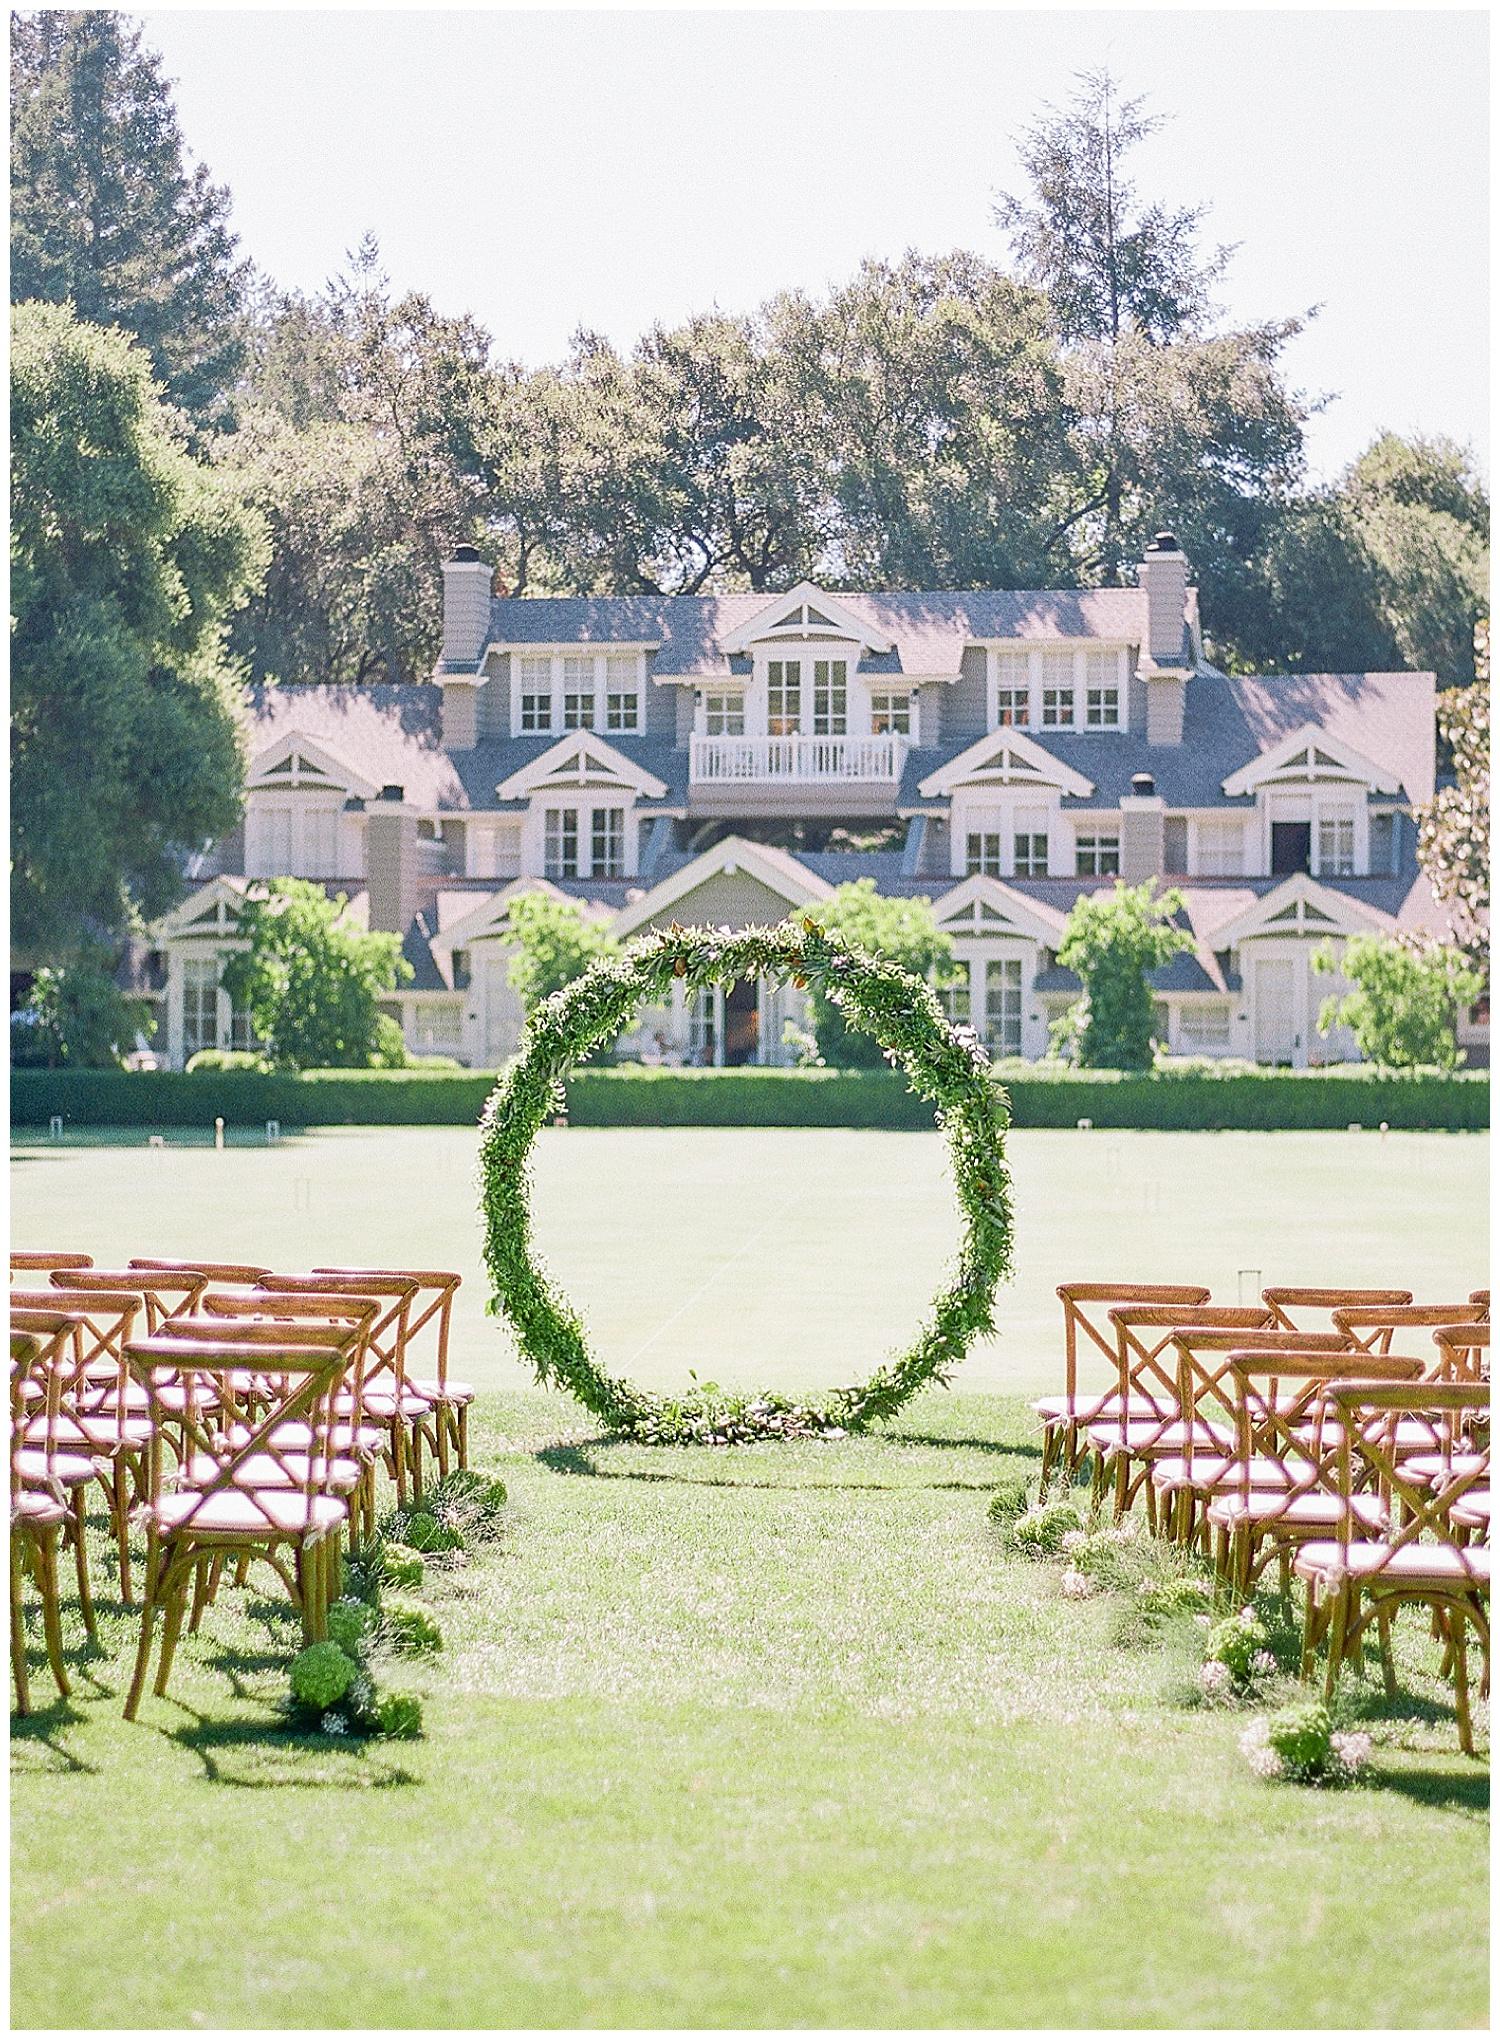 Janine_Licare_Photography_San_Francisco_Wedding_Photographer_Meadowood_Napa_Valley_Sonoma_0001.jpg